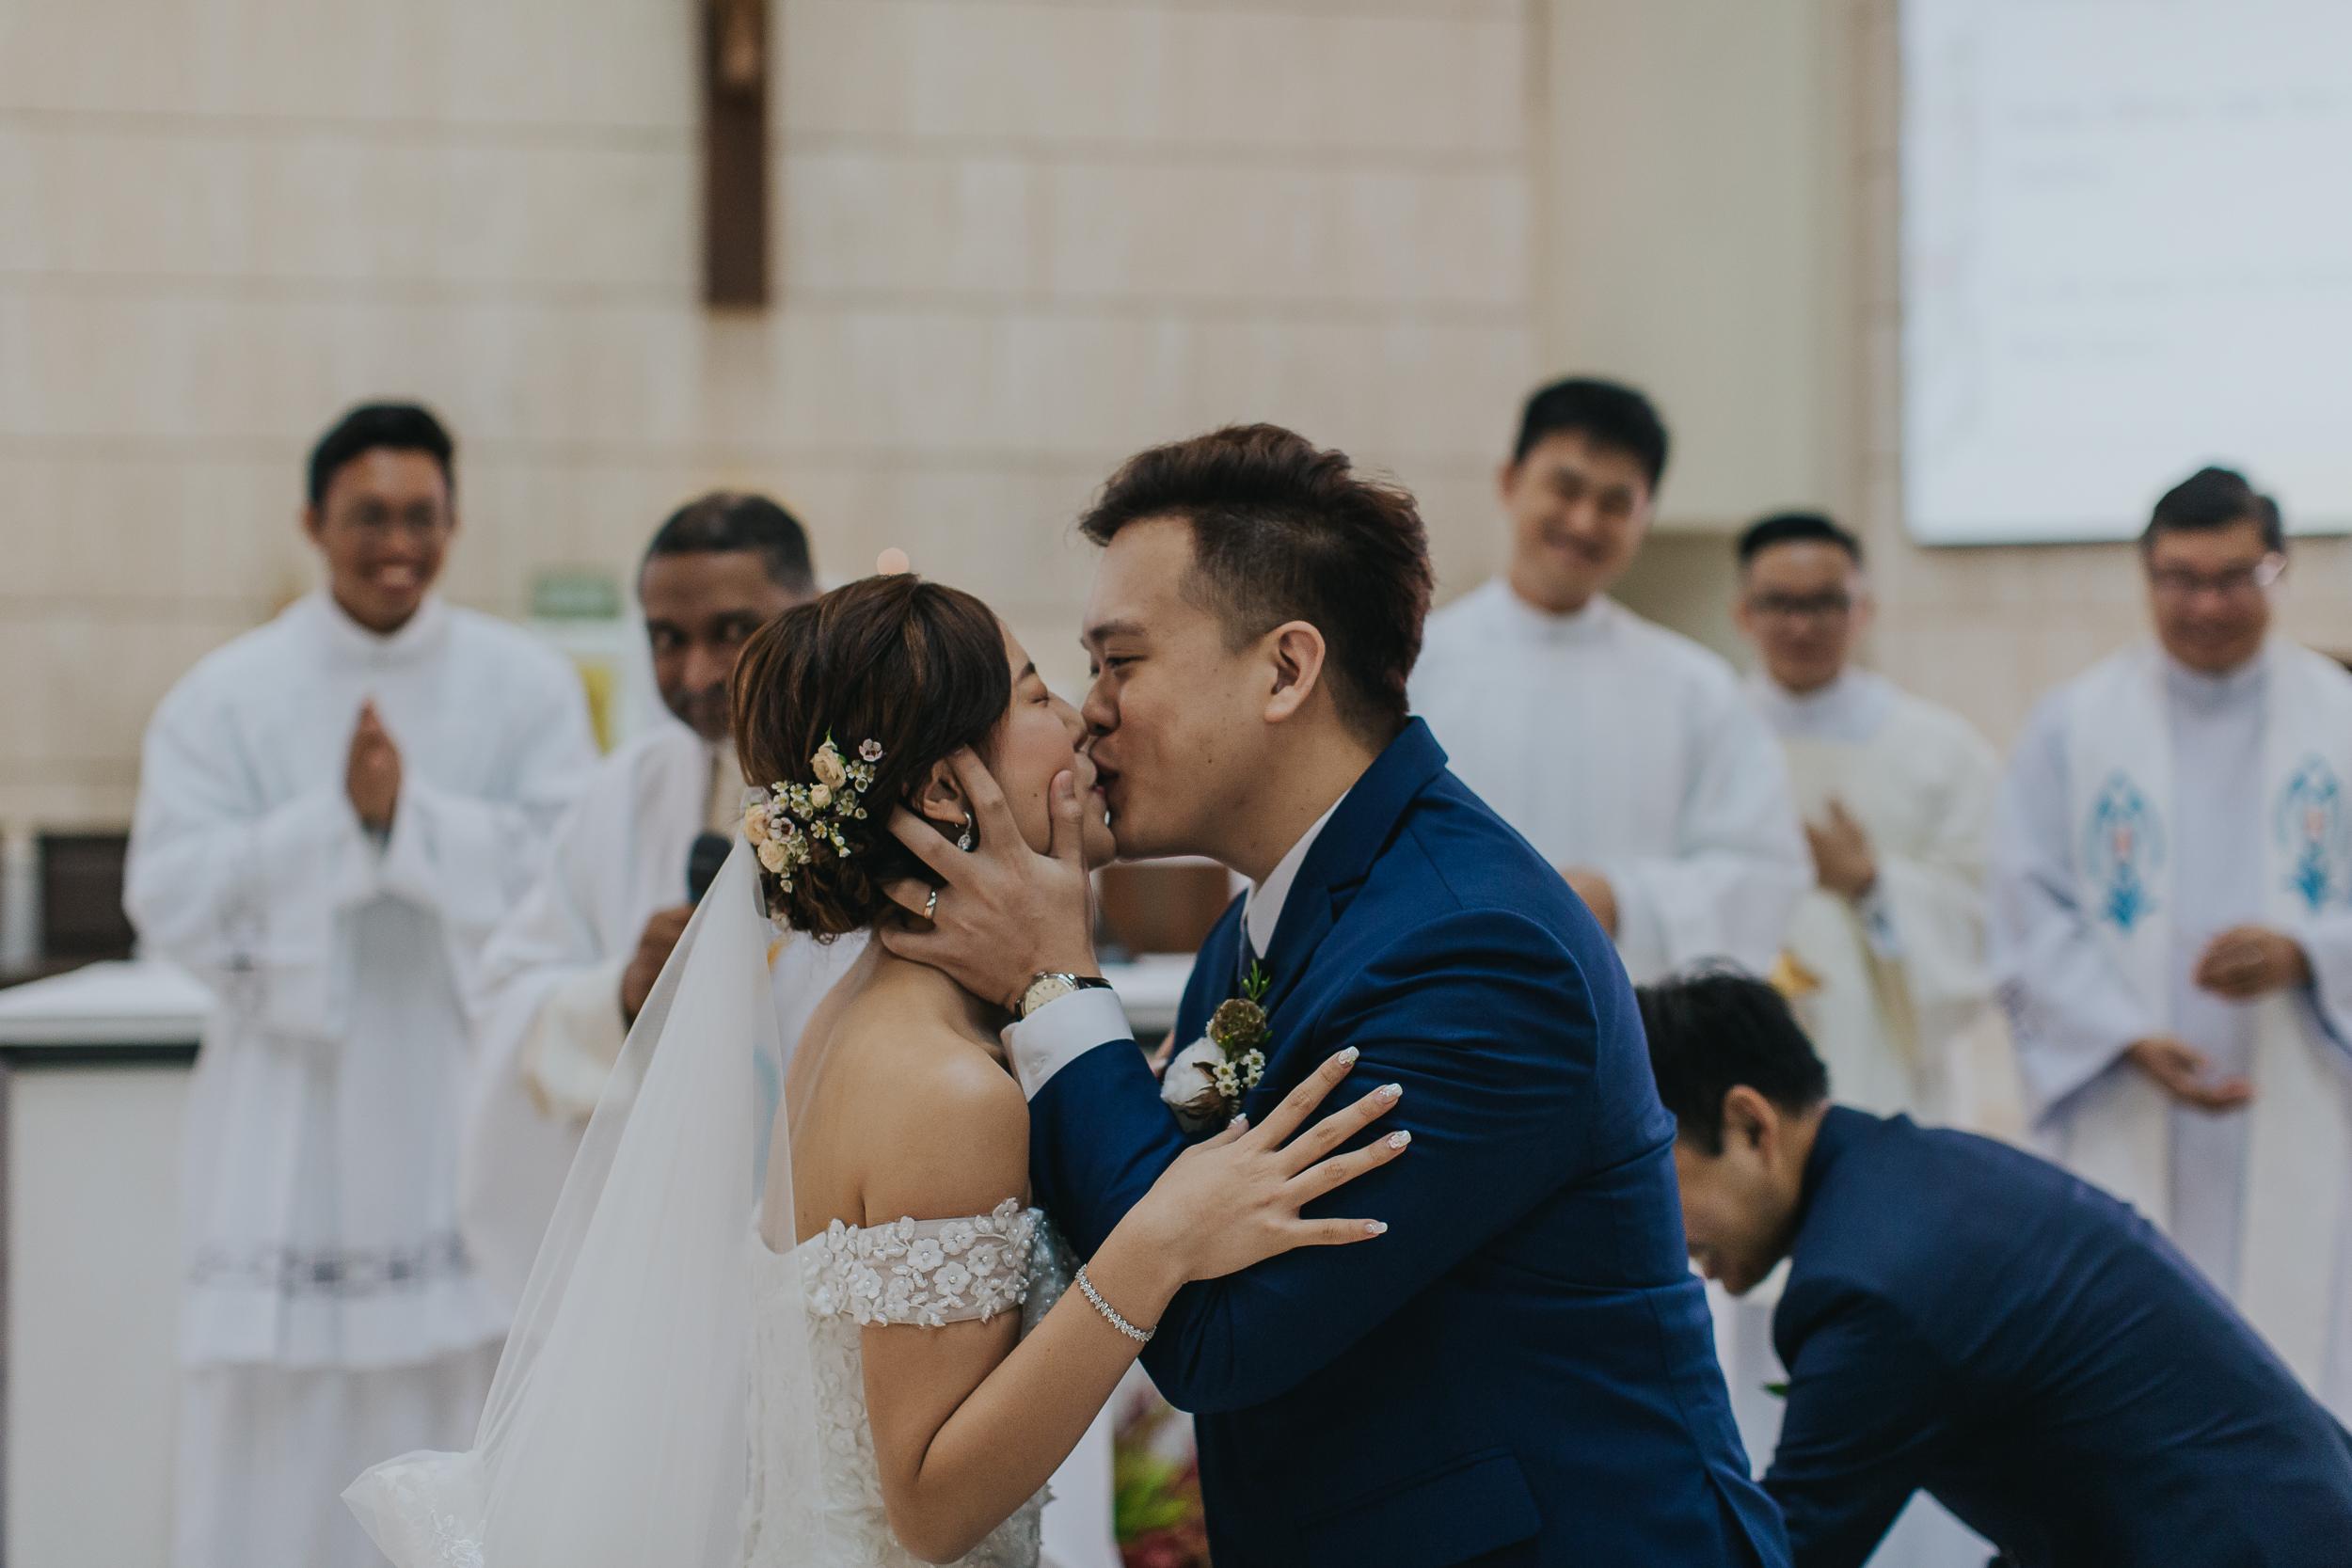 Singapore+Actual+Day+Wedding+Photographer+Grand+Mercure+Oliver+Estelle-0057.jpg